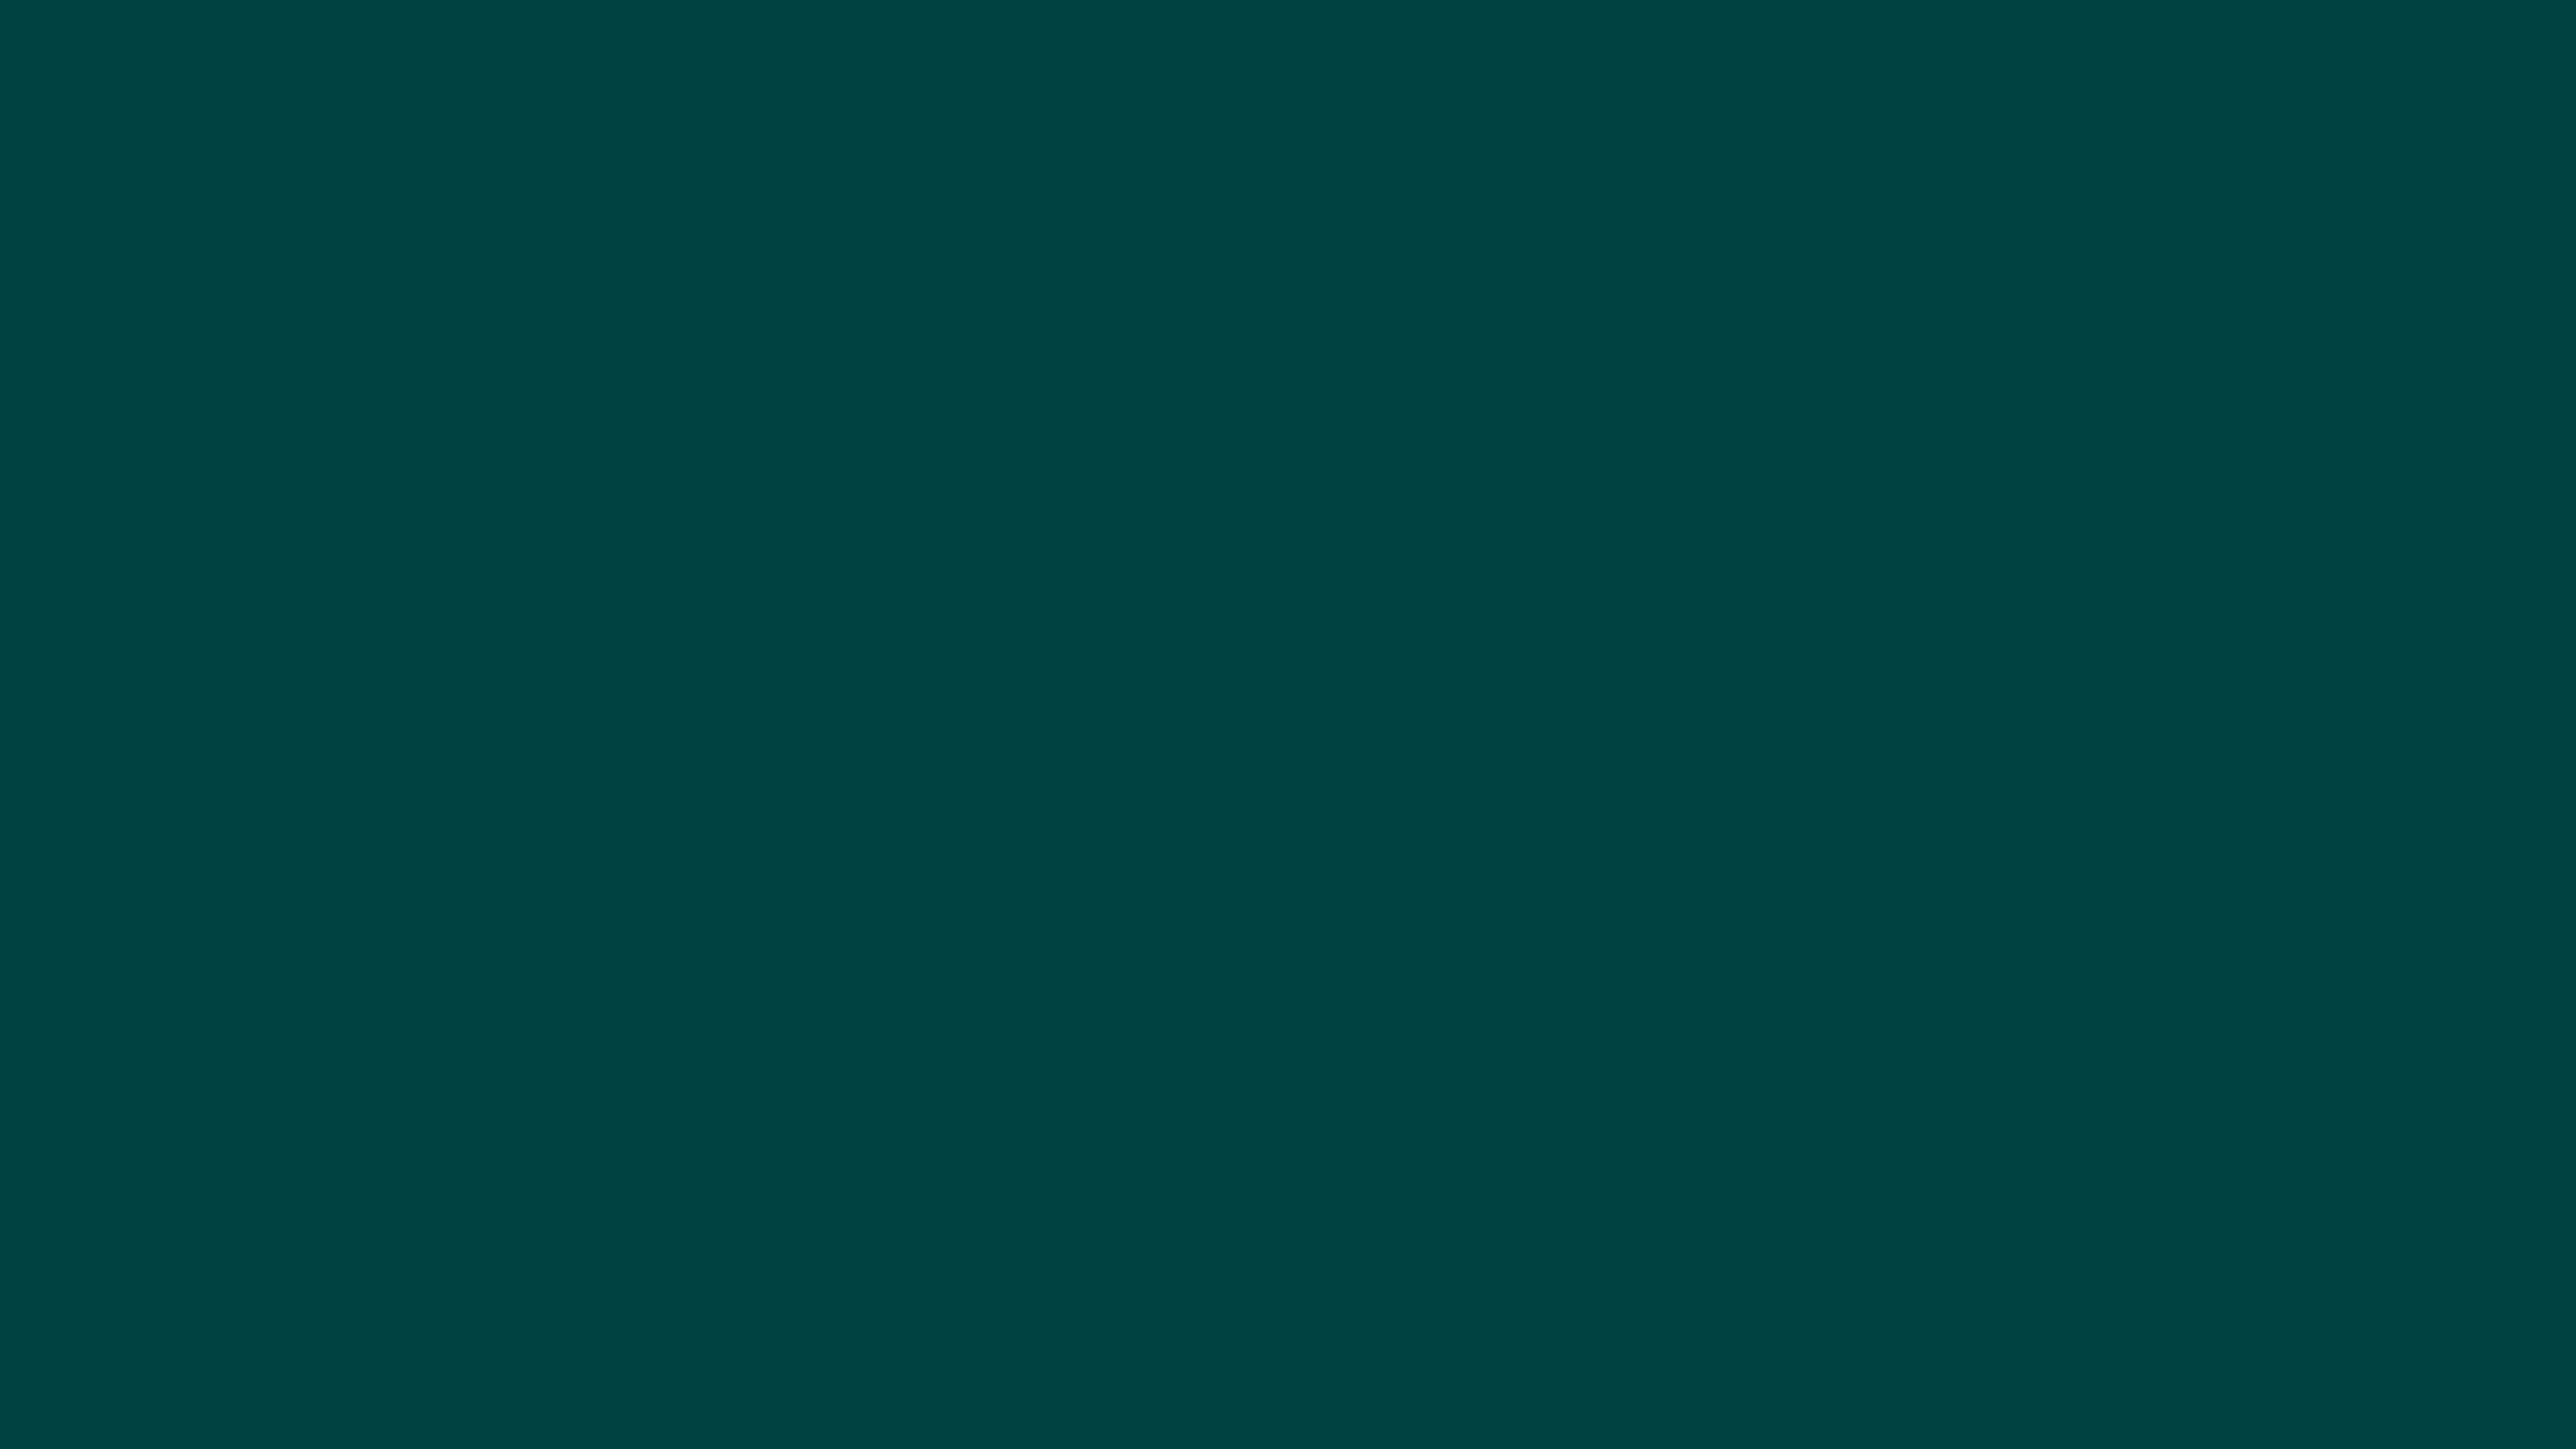 4096x2304 Warm Black Solid Color Background